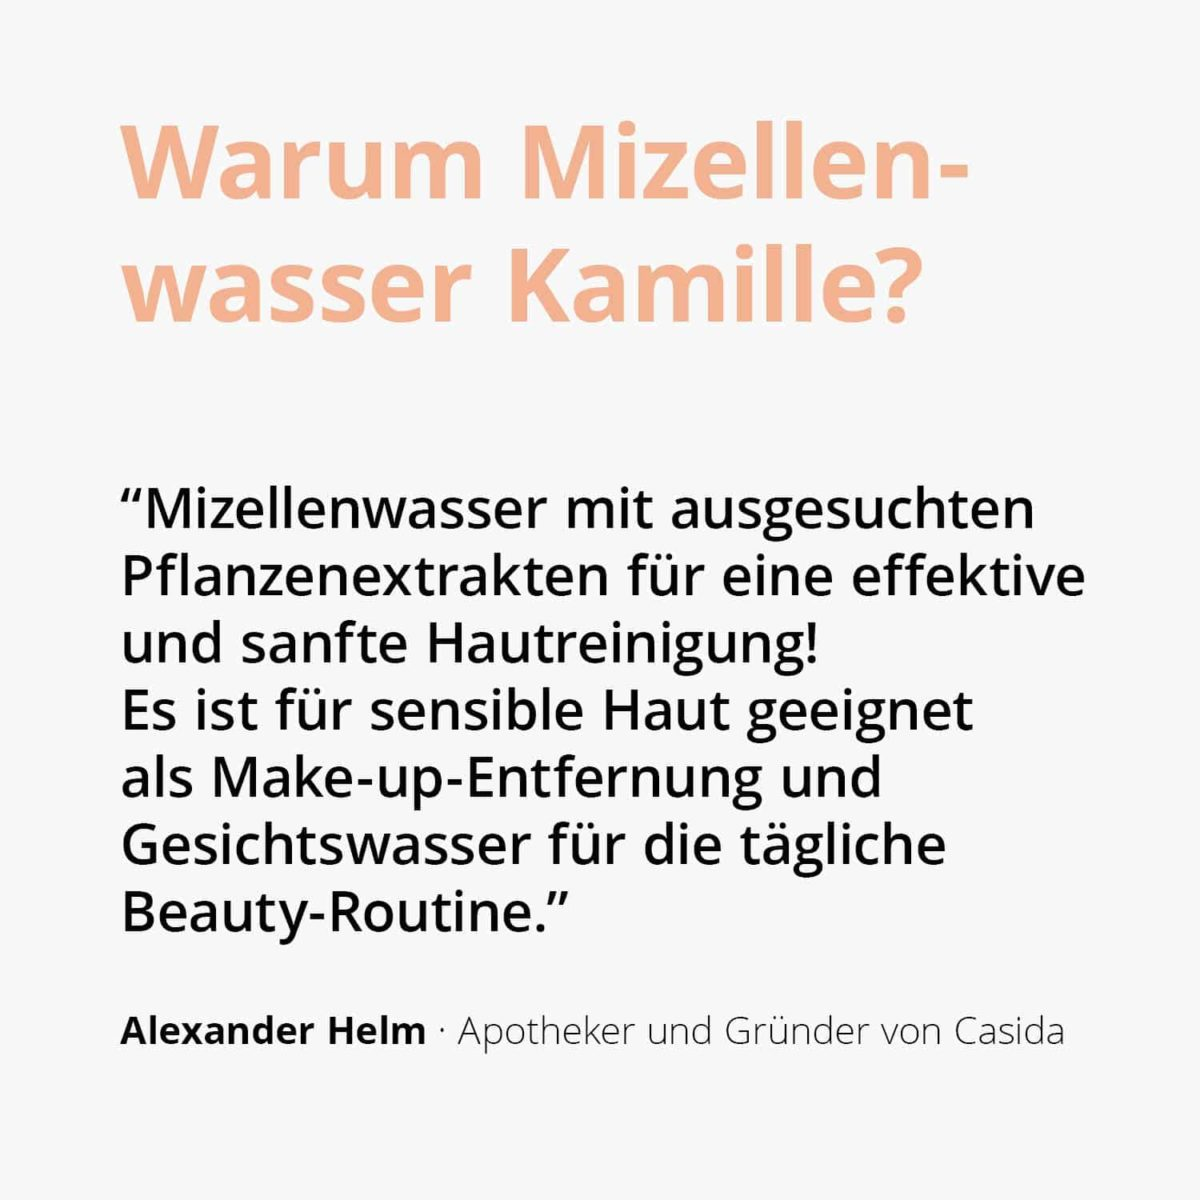 Casida Mizellenwasser Kamille Natural – 150 ml 15408238 PZN Apotheke Abschminken Make-up pflanzlich2